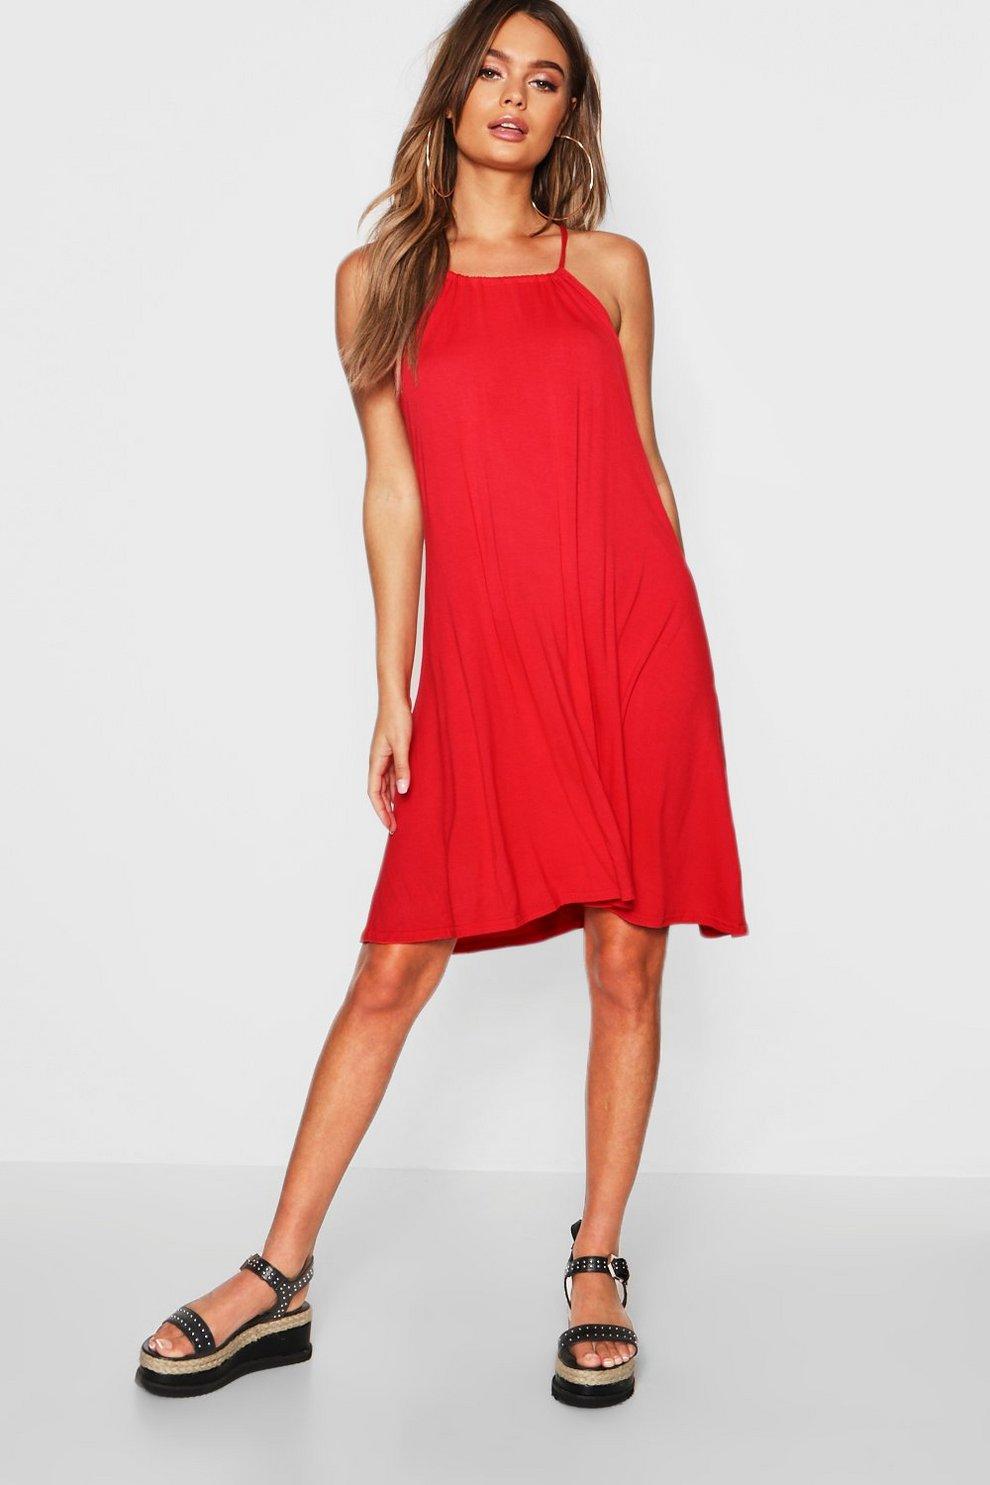 4551cbc22462 Womens Red Tie Neck Swing Dress